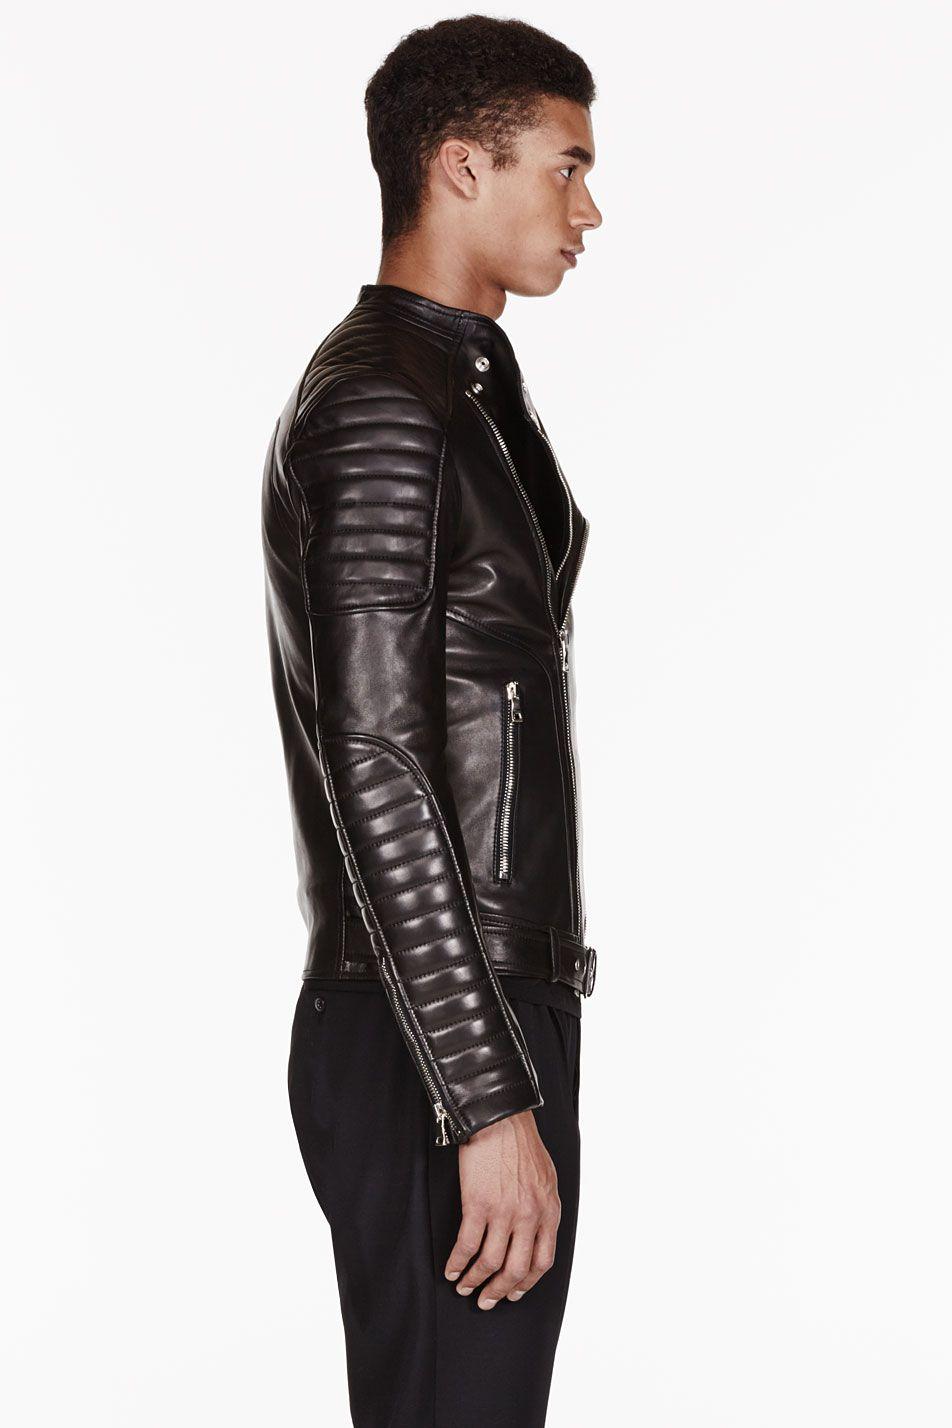 Balmain Black Leather Ribbed Biker Jacket Ssense Balmain Leather Jacket Leather Jacket Men Leather Fashion [ 1428 x 952 Pixel ]